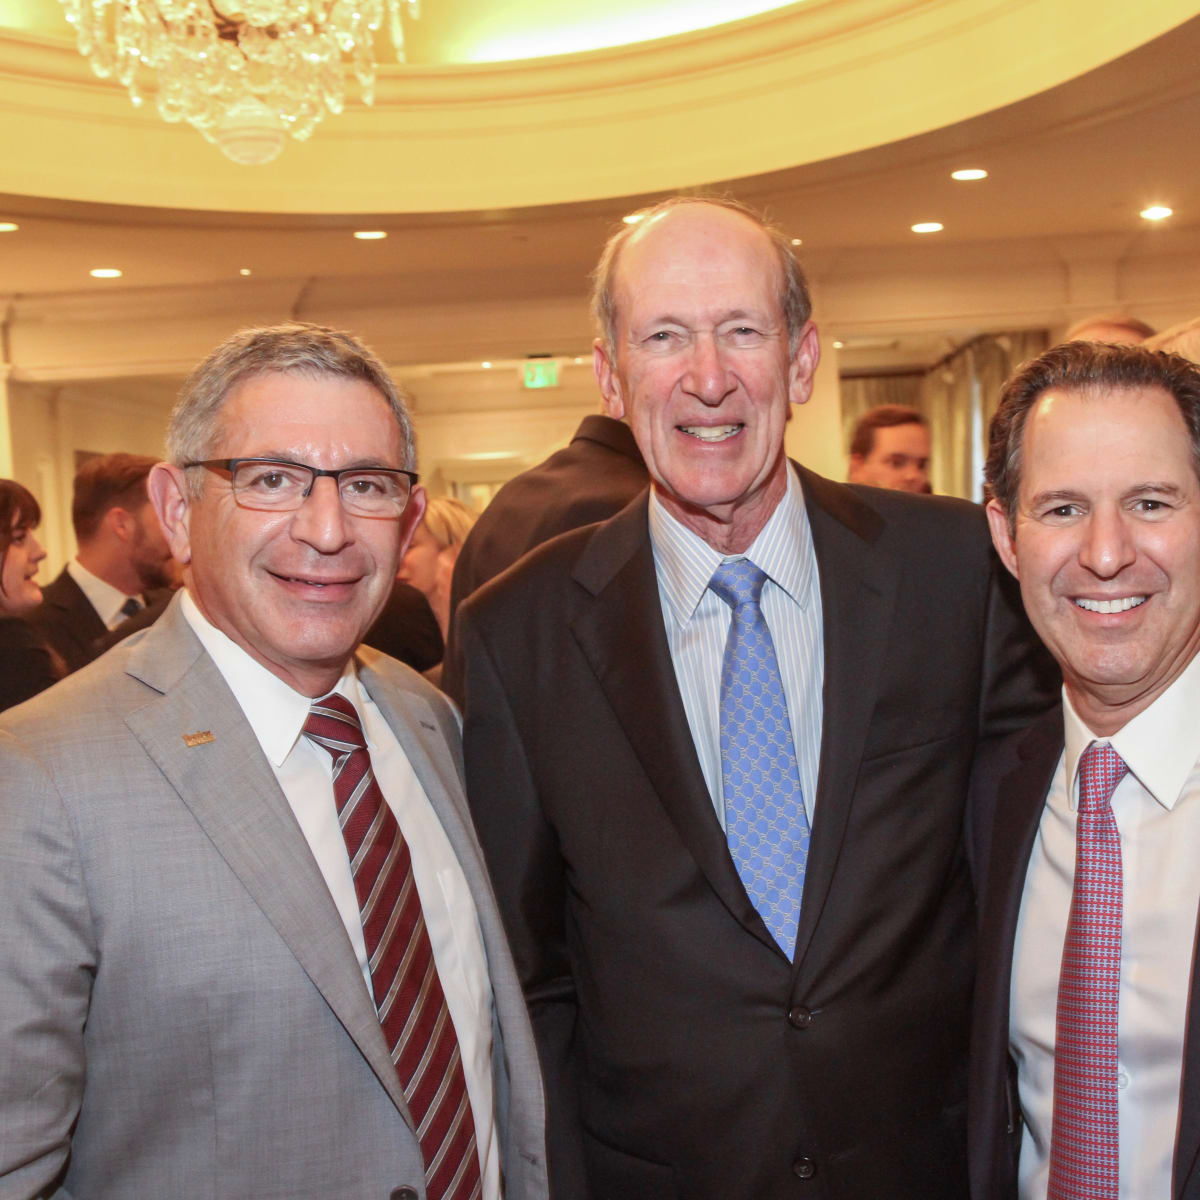 Jubilee of Caring/Dr Paul Klotman, Marc Shapiro and Kitch Taub